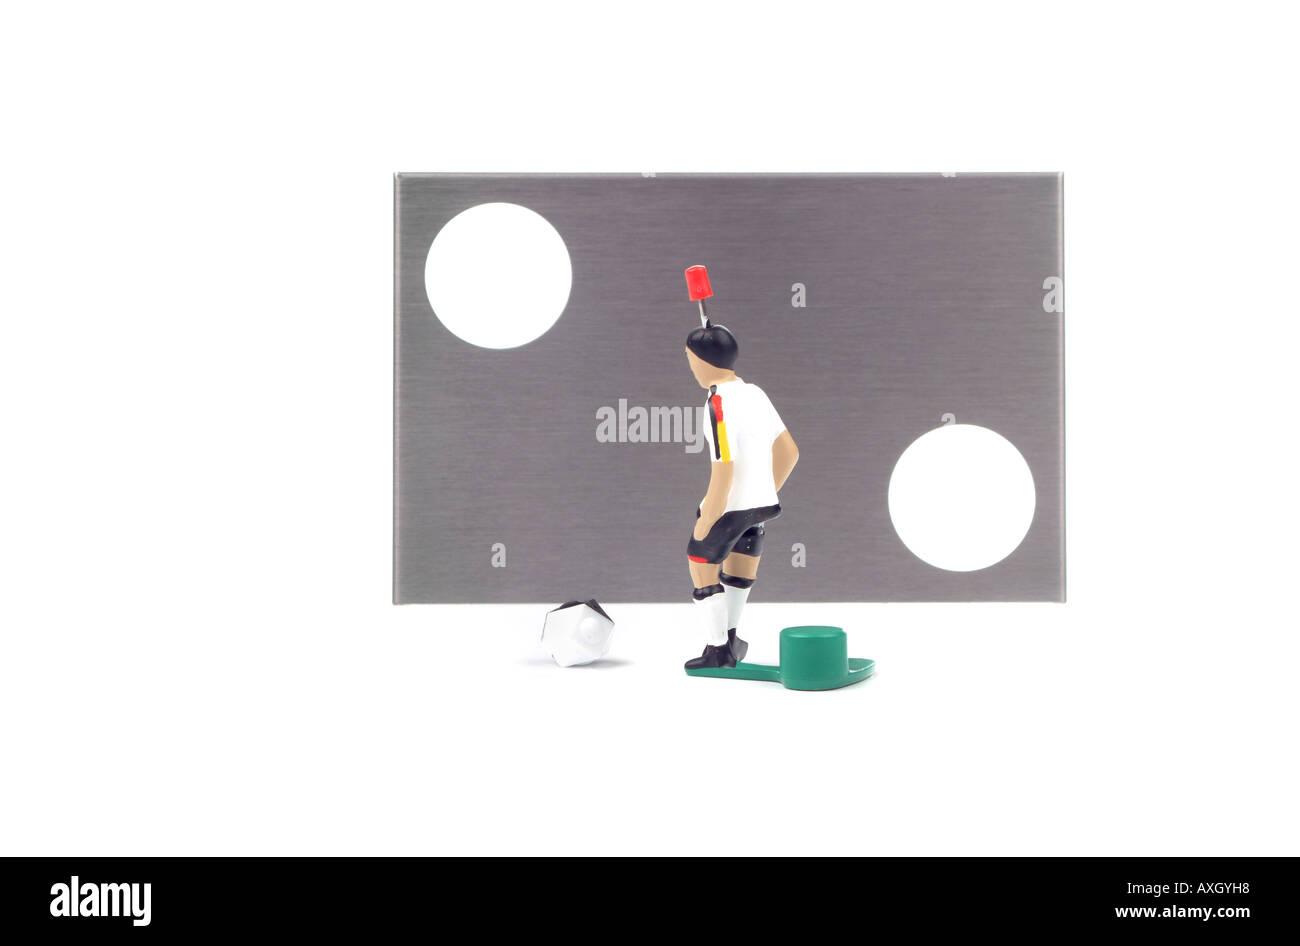 soccer game player Fußballspiel Spieler - Stock Image